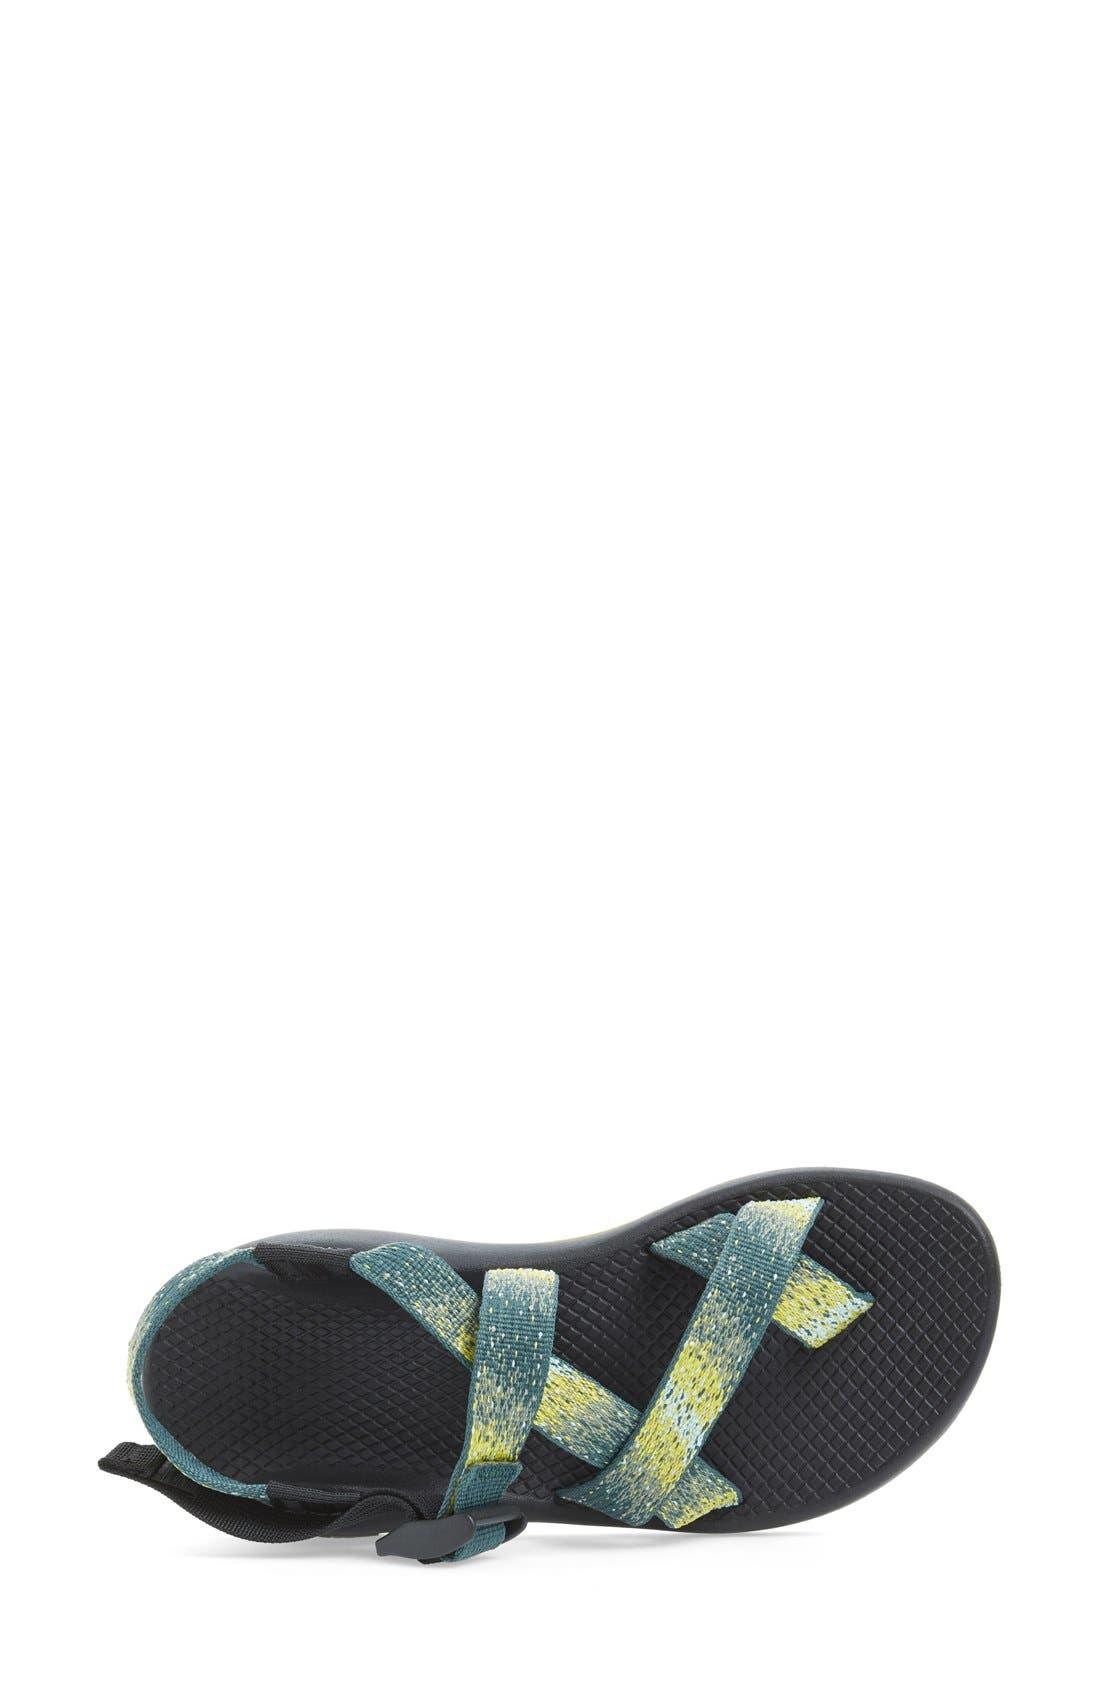 Alternate Image 3  - Chaco 'Z2 Yampa' Sandal